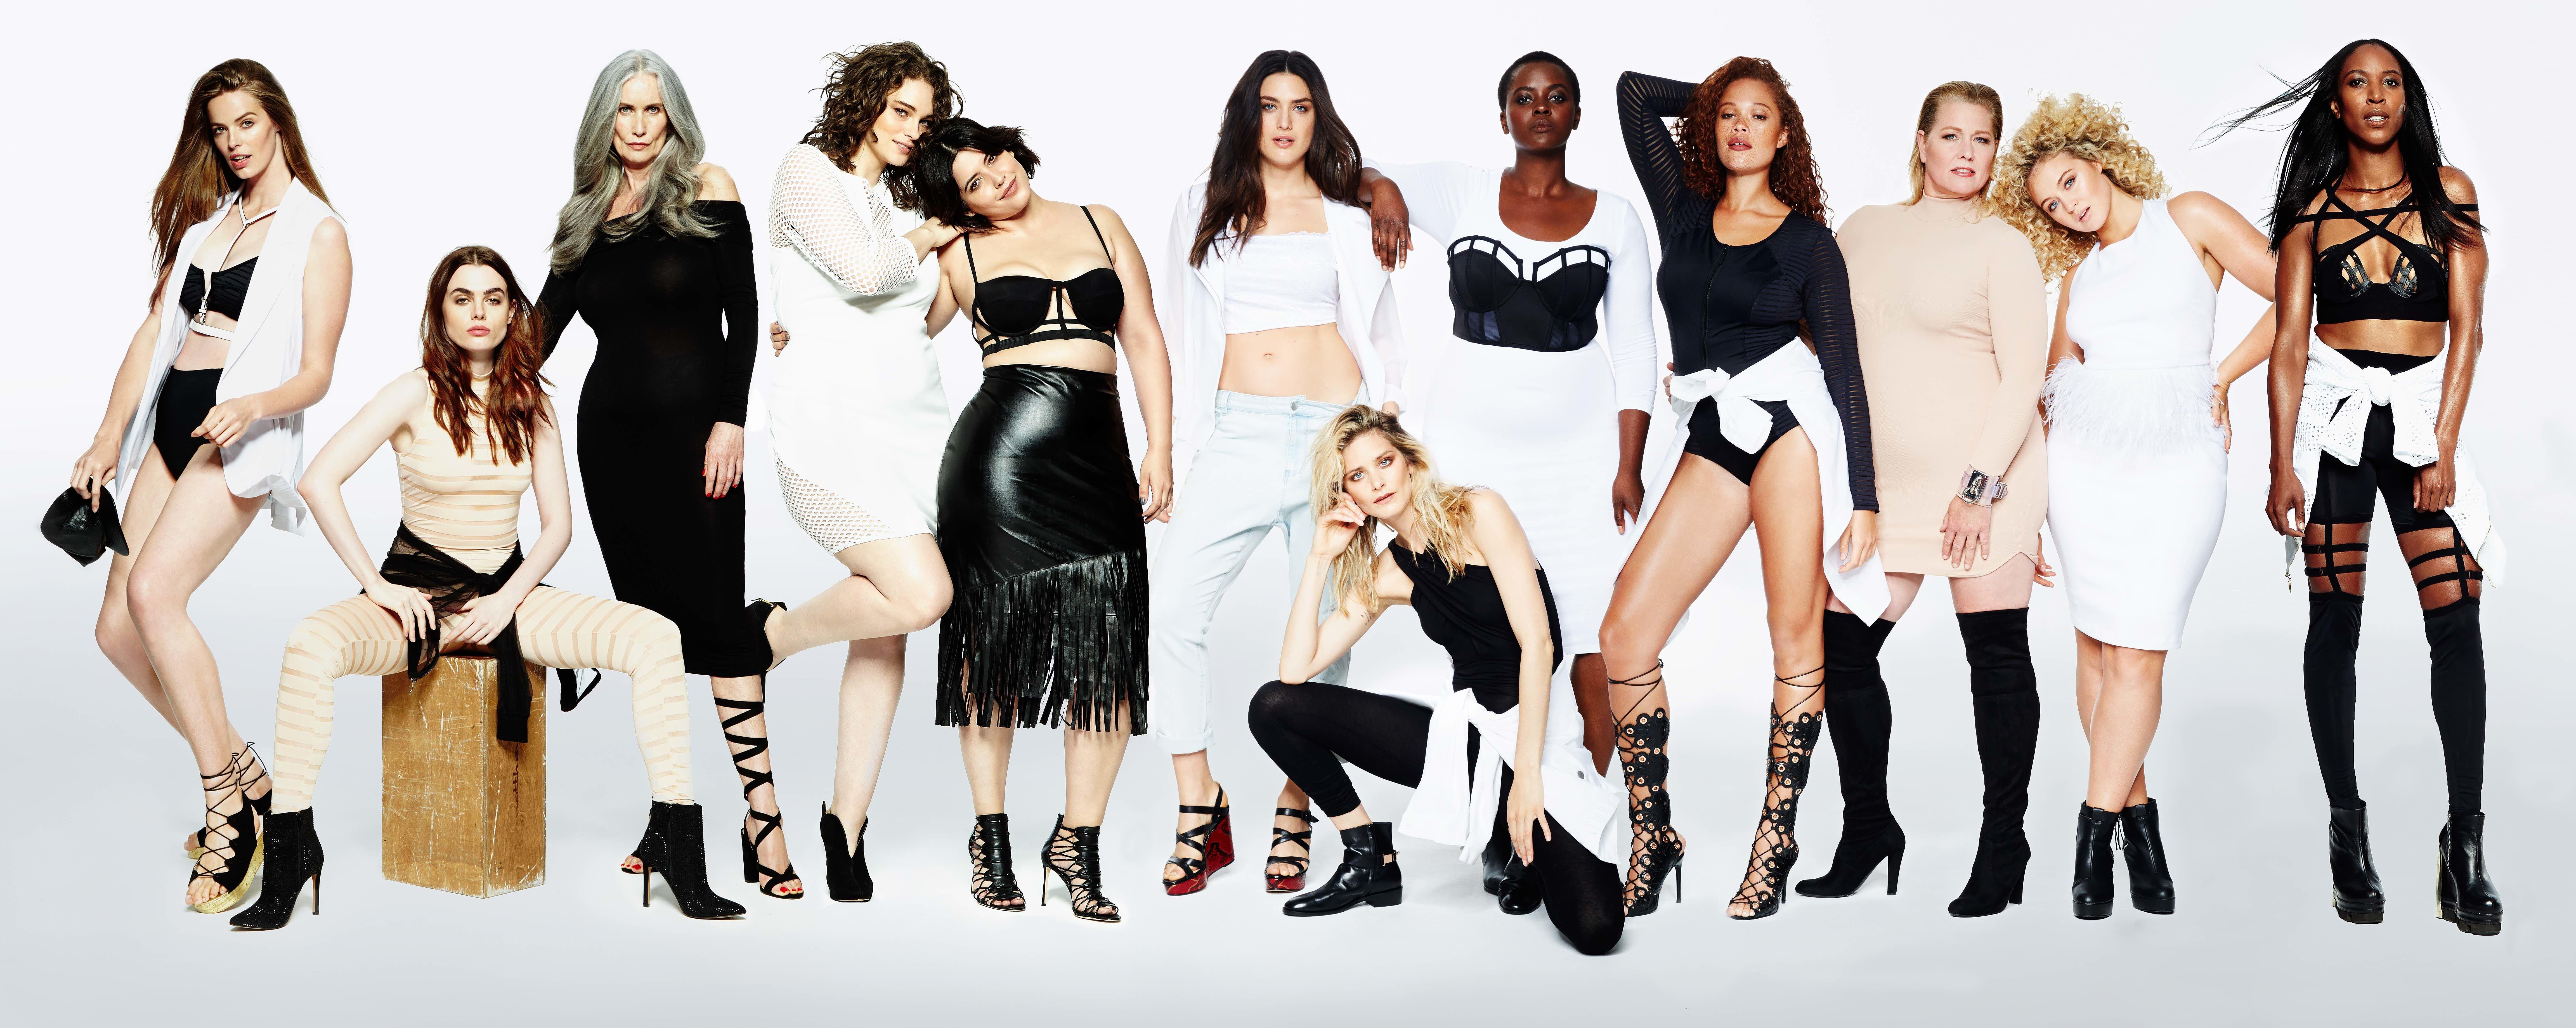 L to R: Robyn Lawley, Charli Howard, Nicola Griffin, Jennie Runk, Denise Bidot, Nathalia Novaes, Erica...